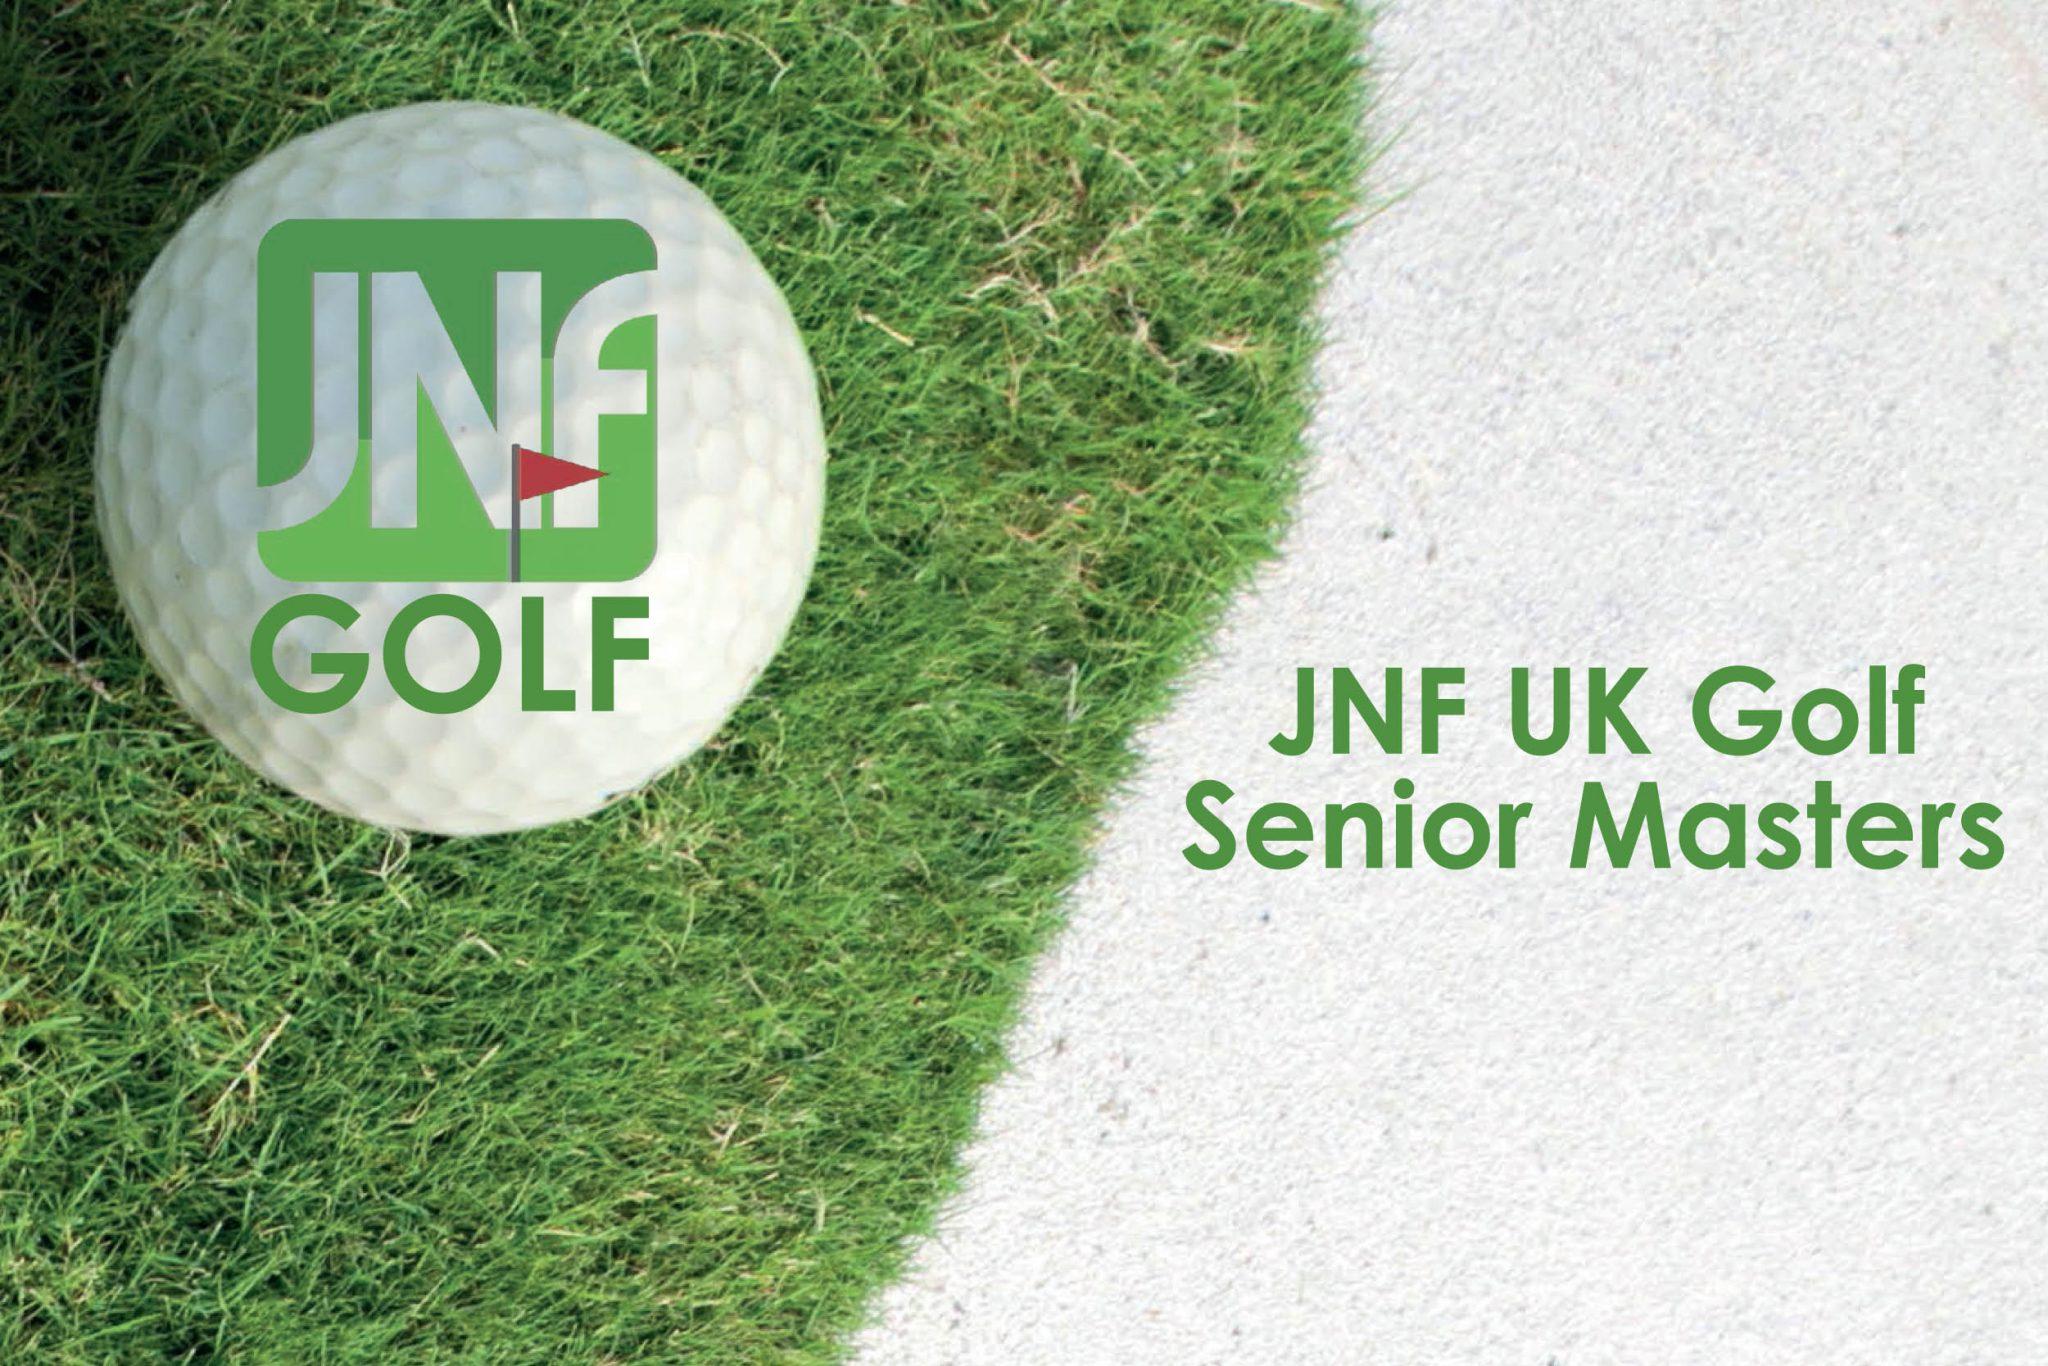 JNF Golf Senior Masters 2020